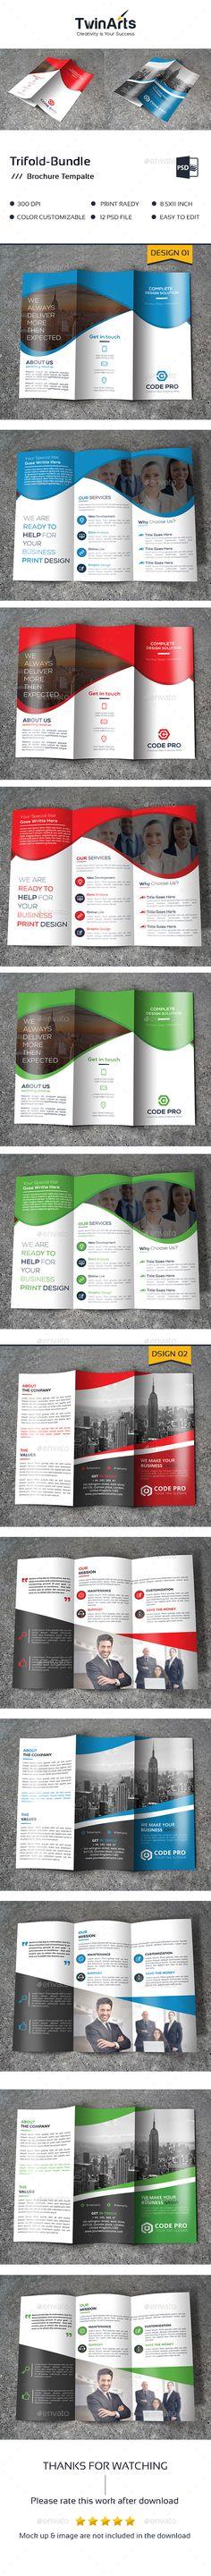 Tri-fold Brochure Templates PSD Bundle. Download here: https://graphicriver.net/item/trifold-bundle_2-in-1/17460824?ref=ksioks